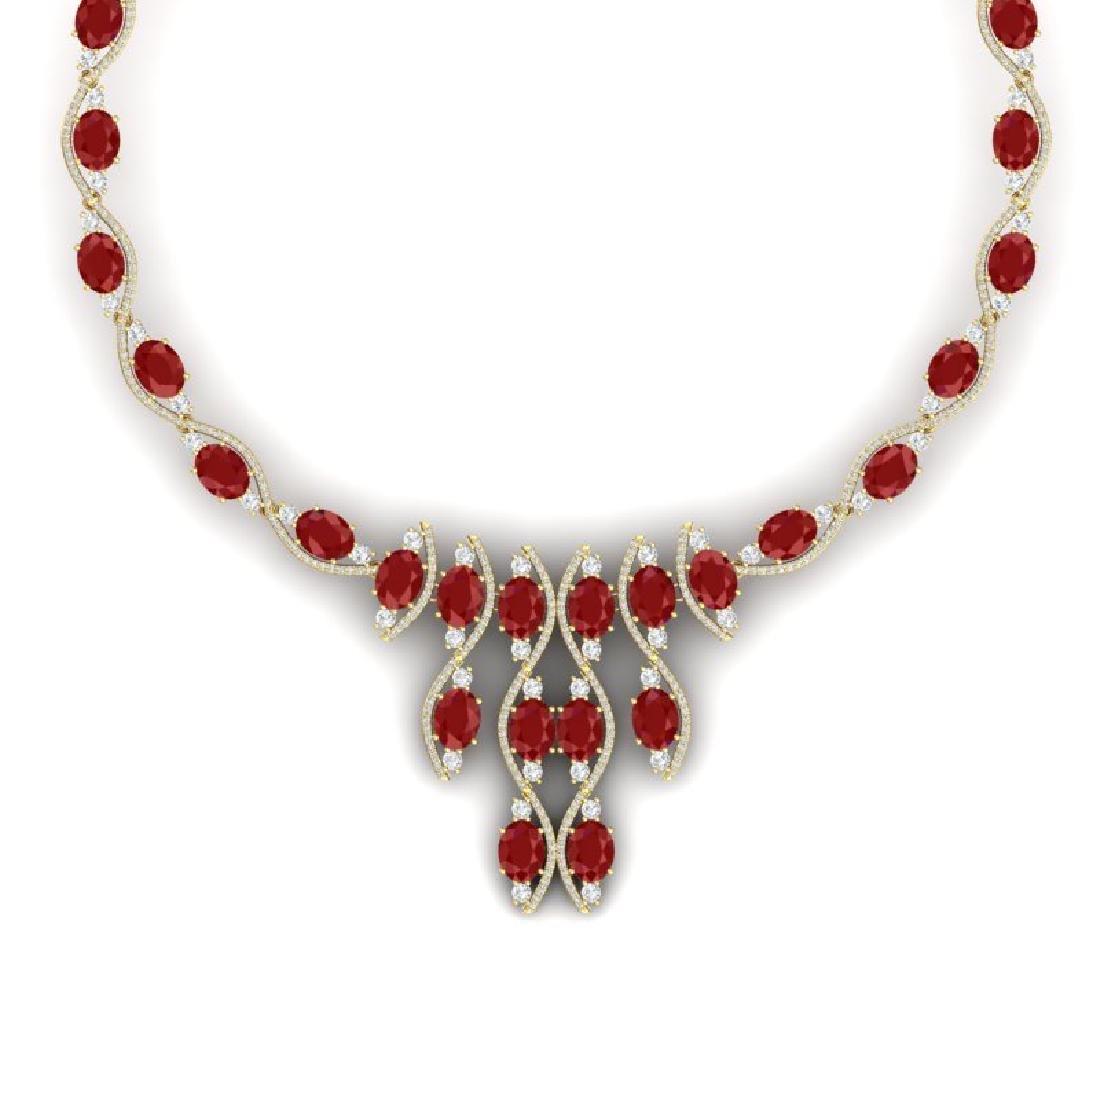 65.93 CTW Royalty Ruby & VS Diamond Necklace 18K Yellow - 2